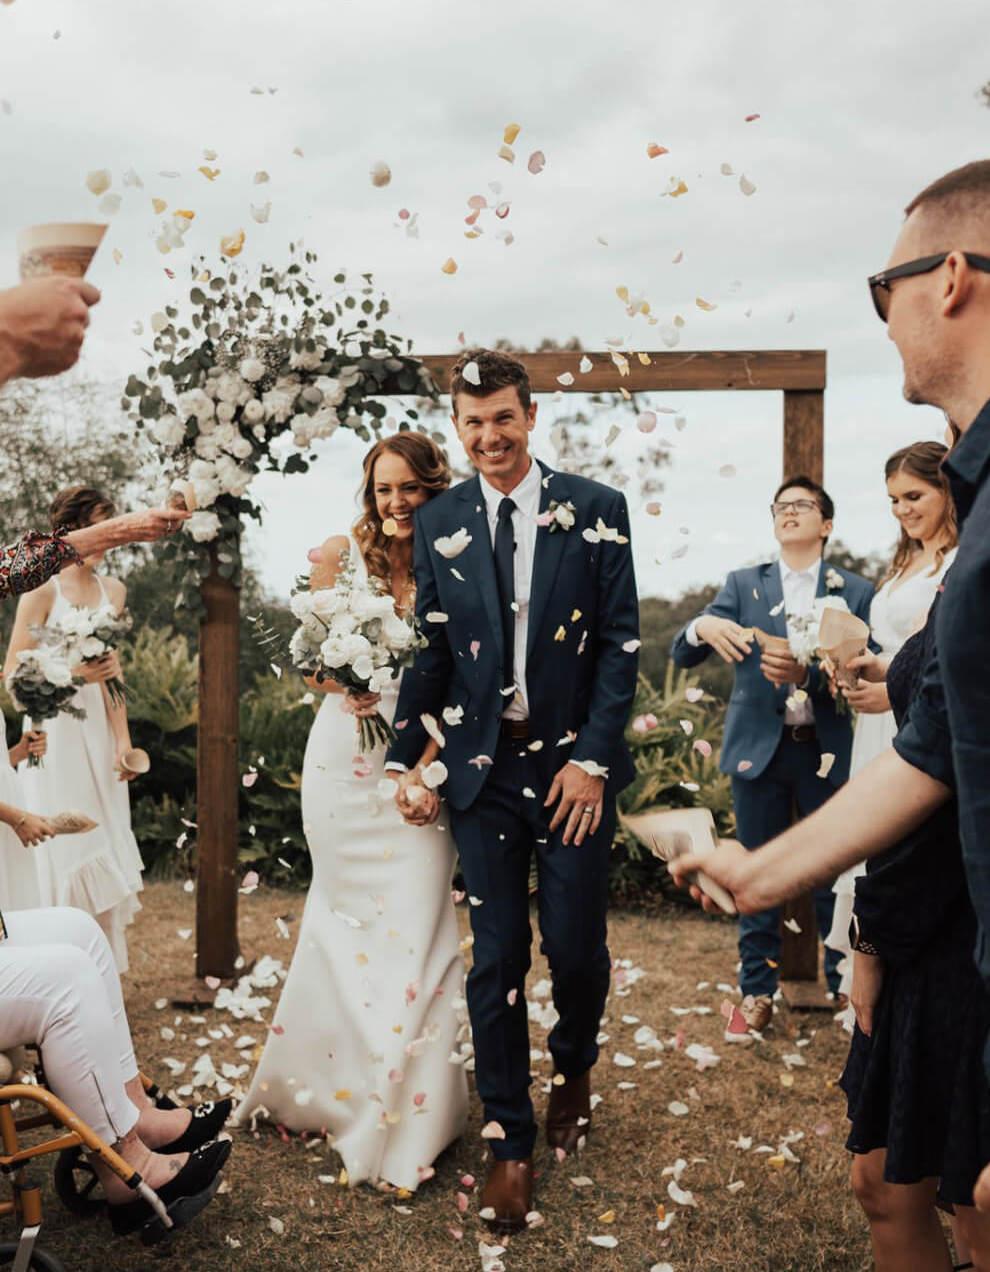 Best Wedding Coordinator Toowoomba QLD Bird and Boy Photography Cropped